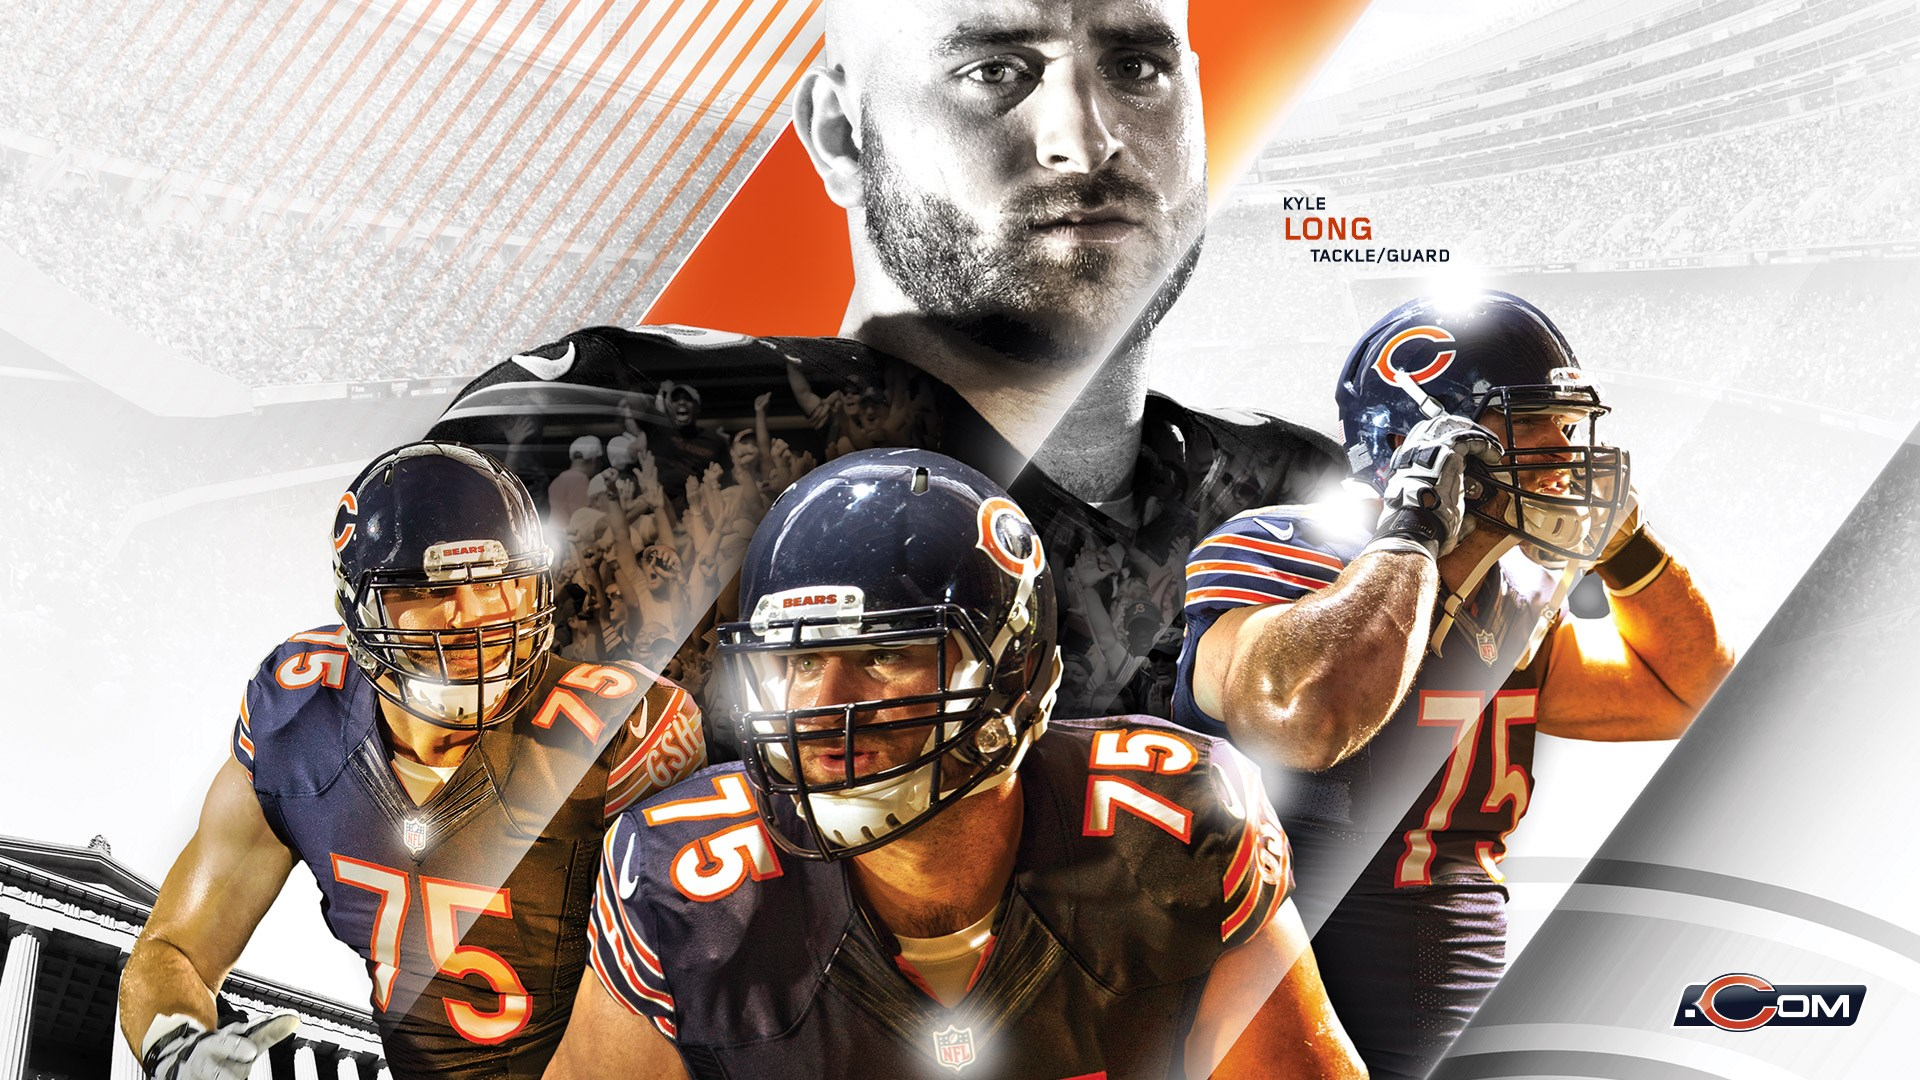 Chicago Bears nfl football sports wallpaper | 1920x1080 ...